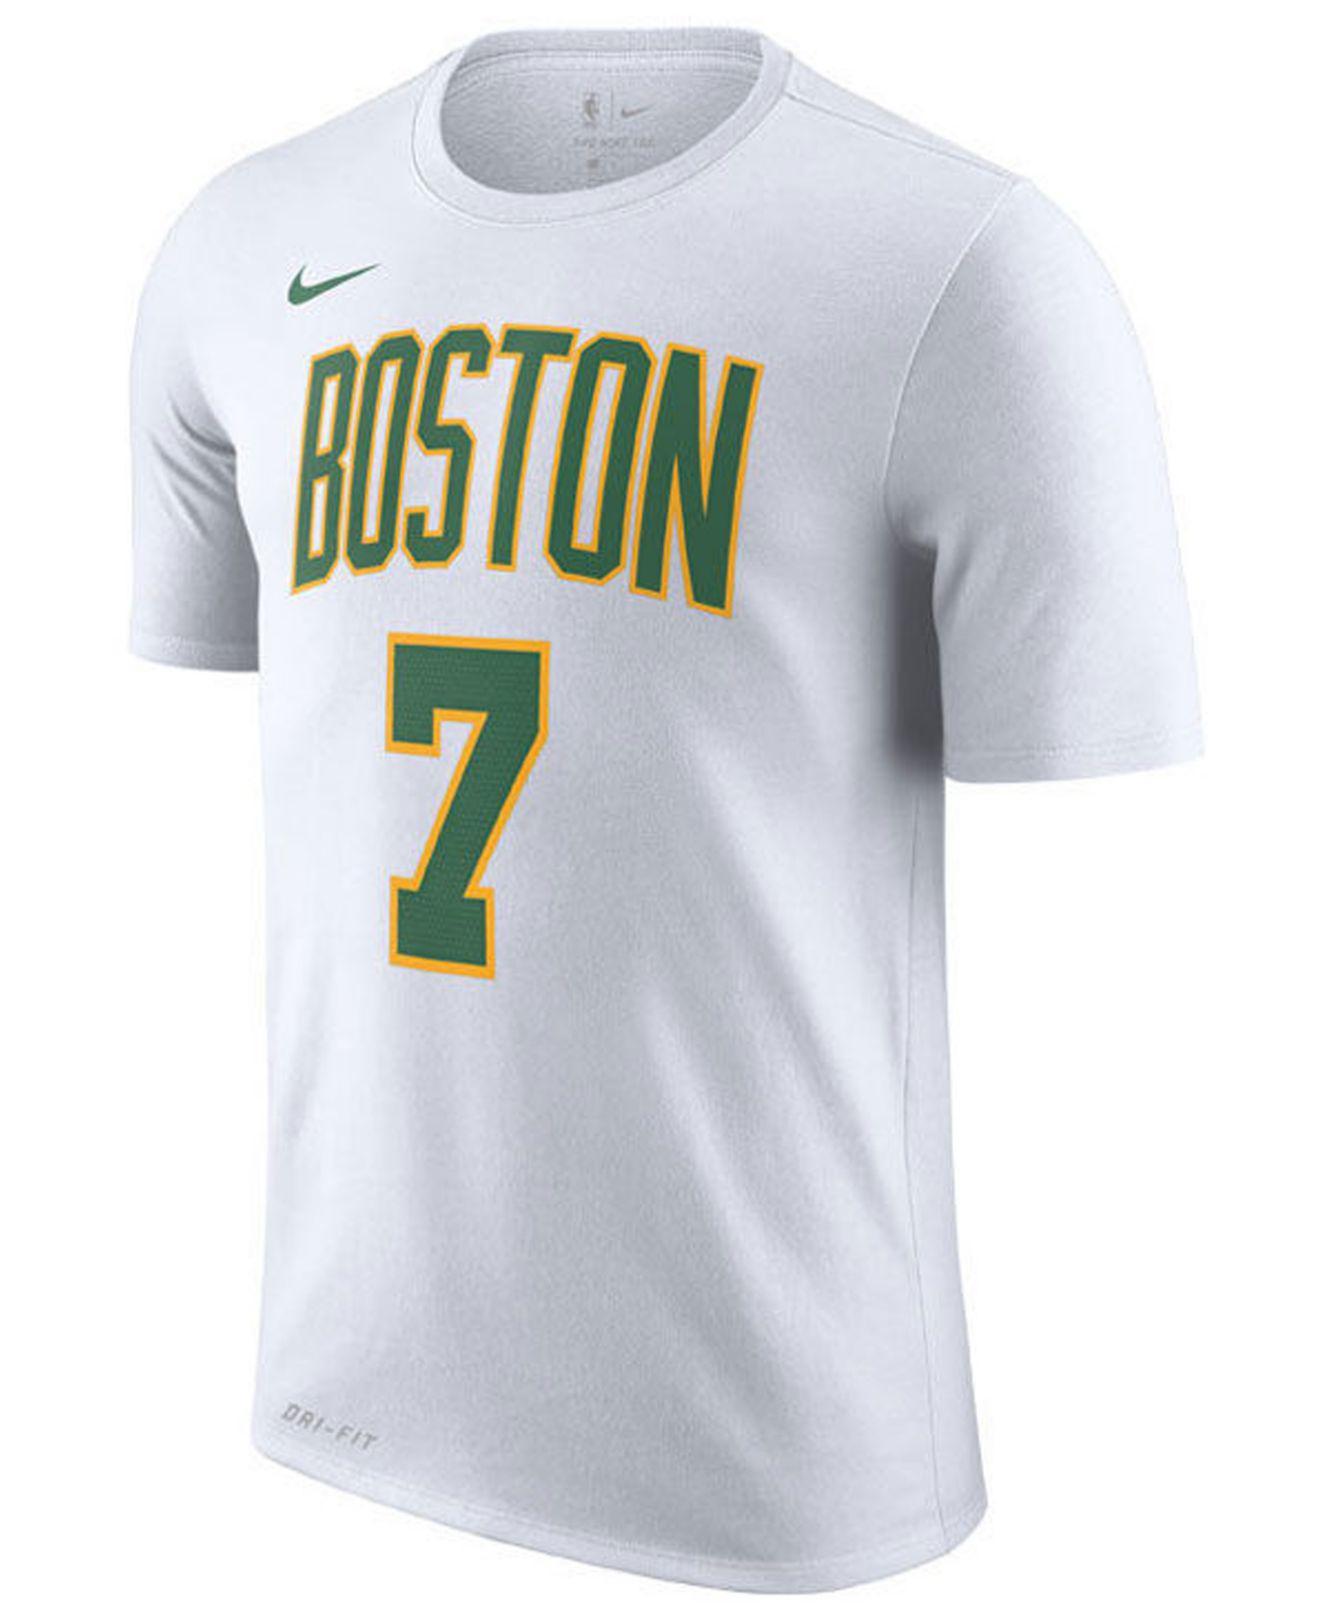 a50b28cc6 Nike - White Jaylen Brown Boston Celtics City Player T-shirt 2018 for Men  -. View fullscreen